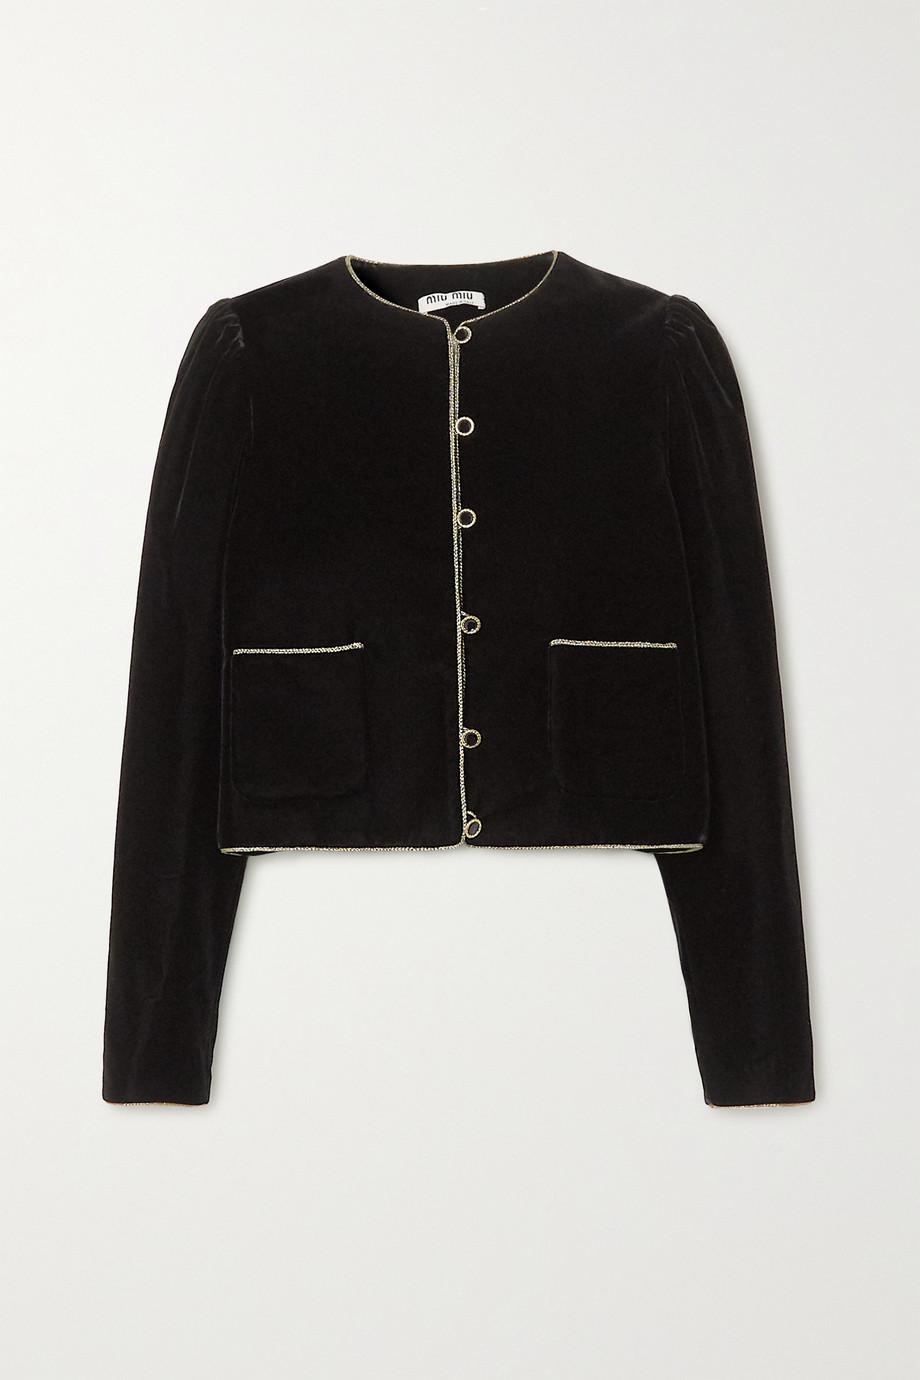 Miu Miu Rope-trimmed velvet blazer